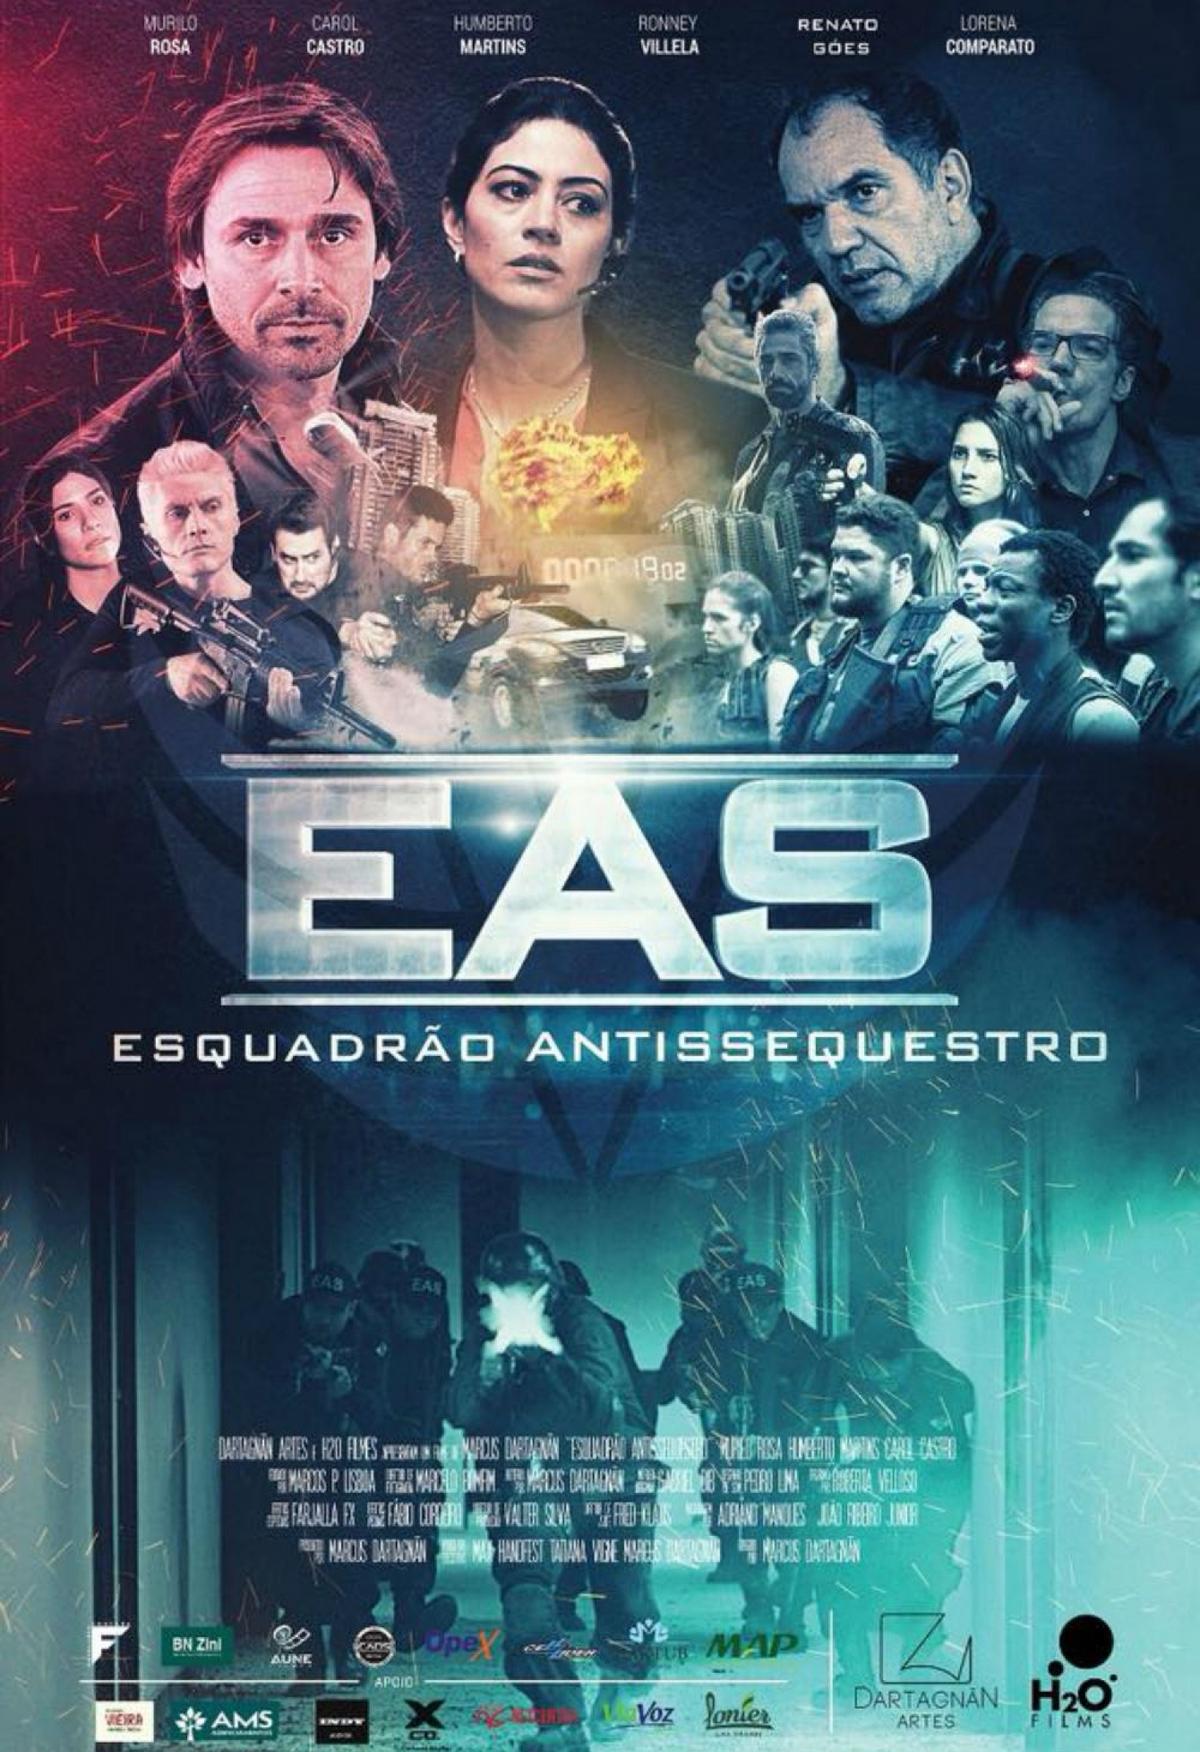 Imagem capa - Still - Filme EAS por Fabio Bahiense